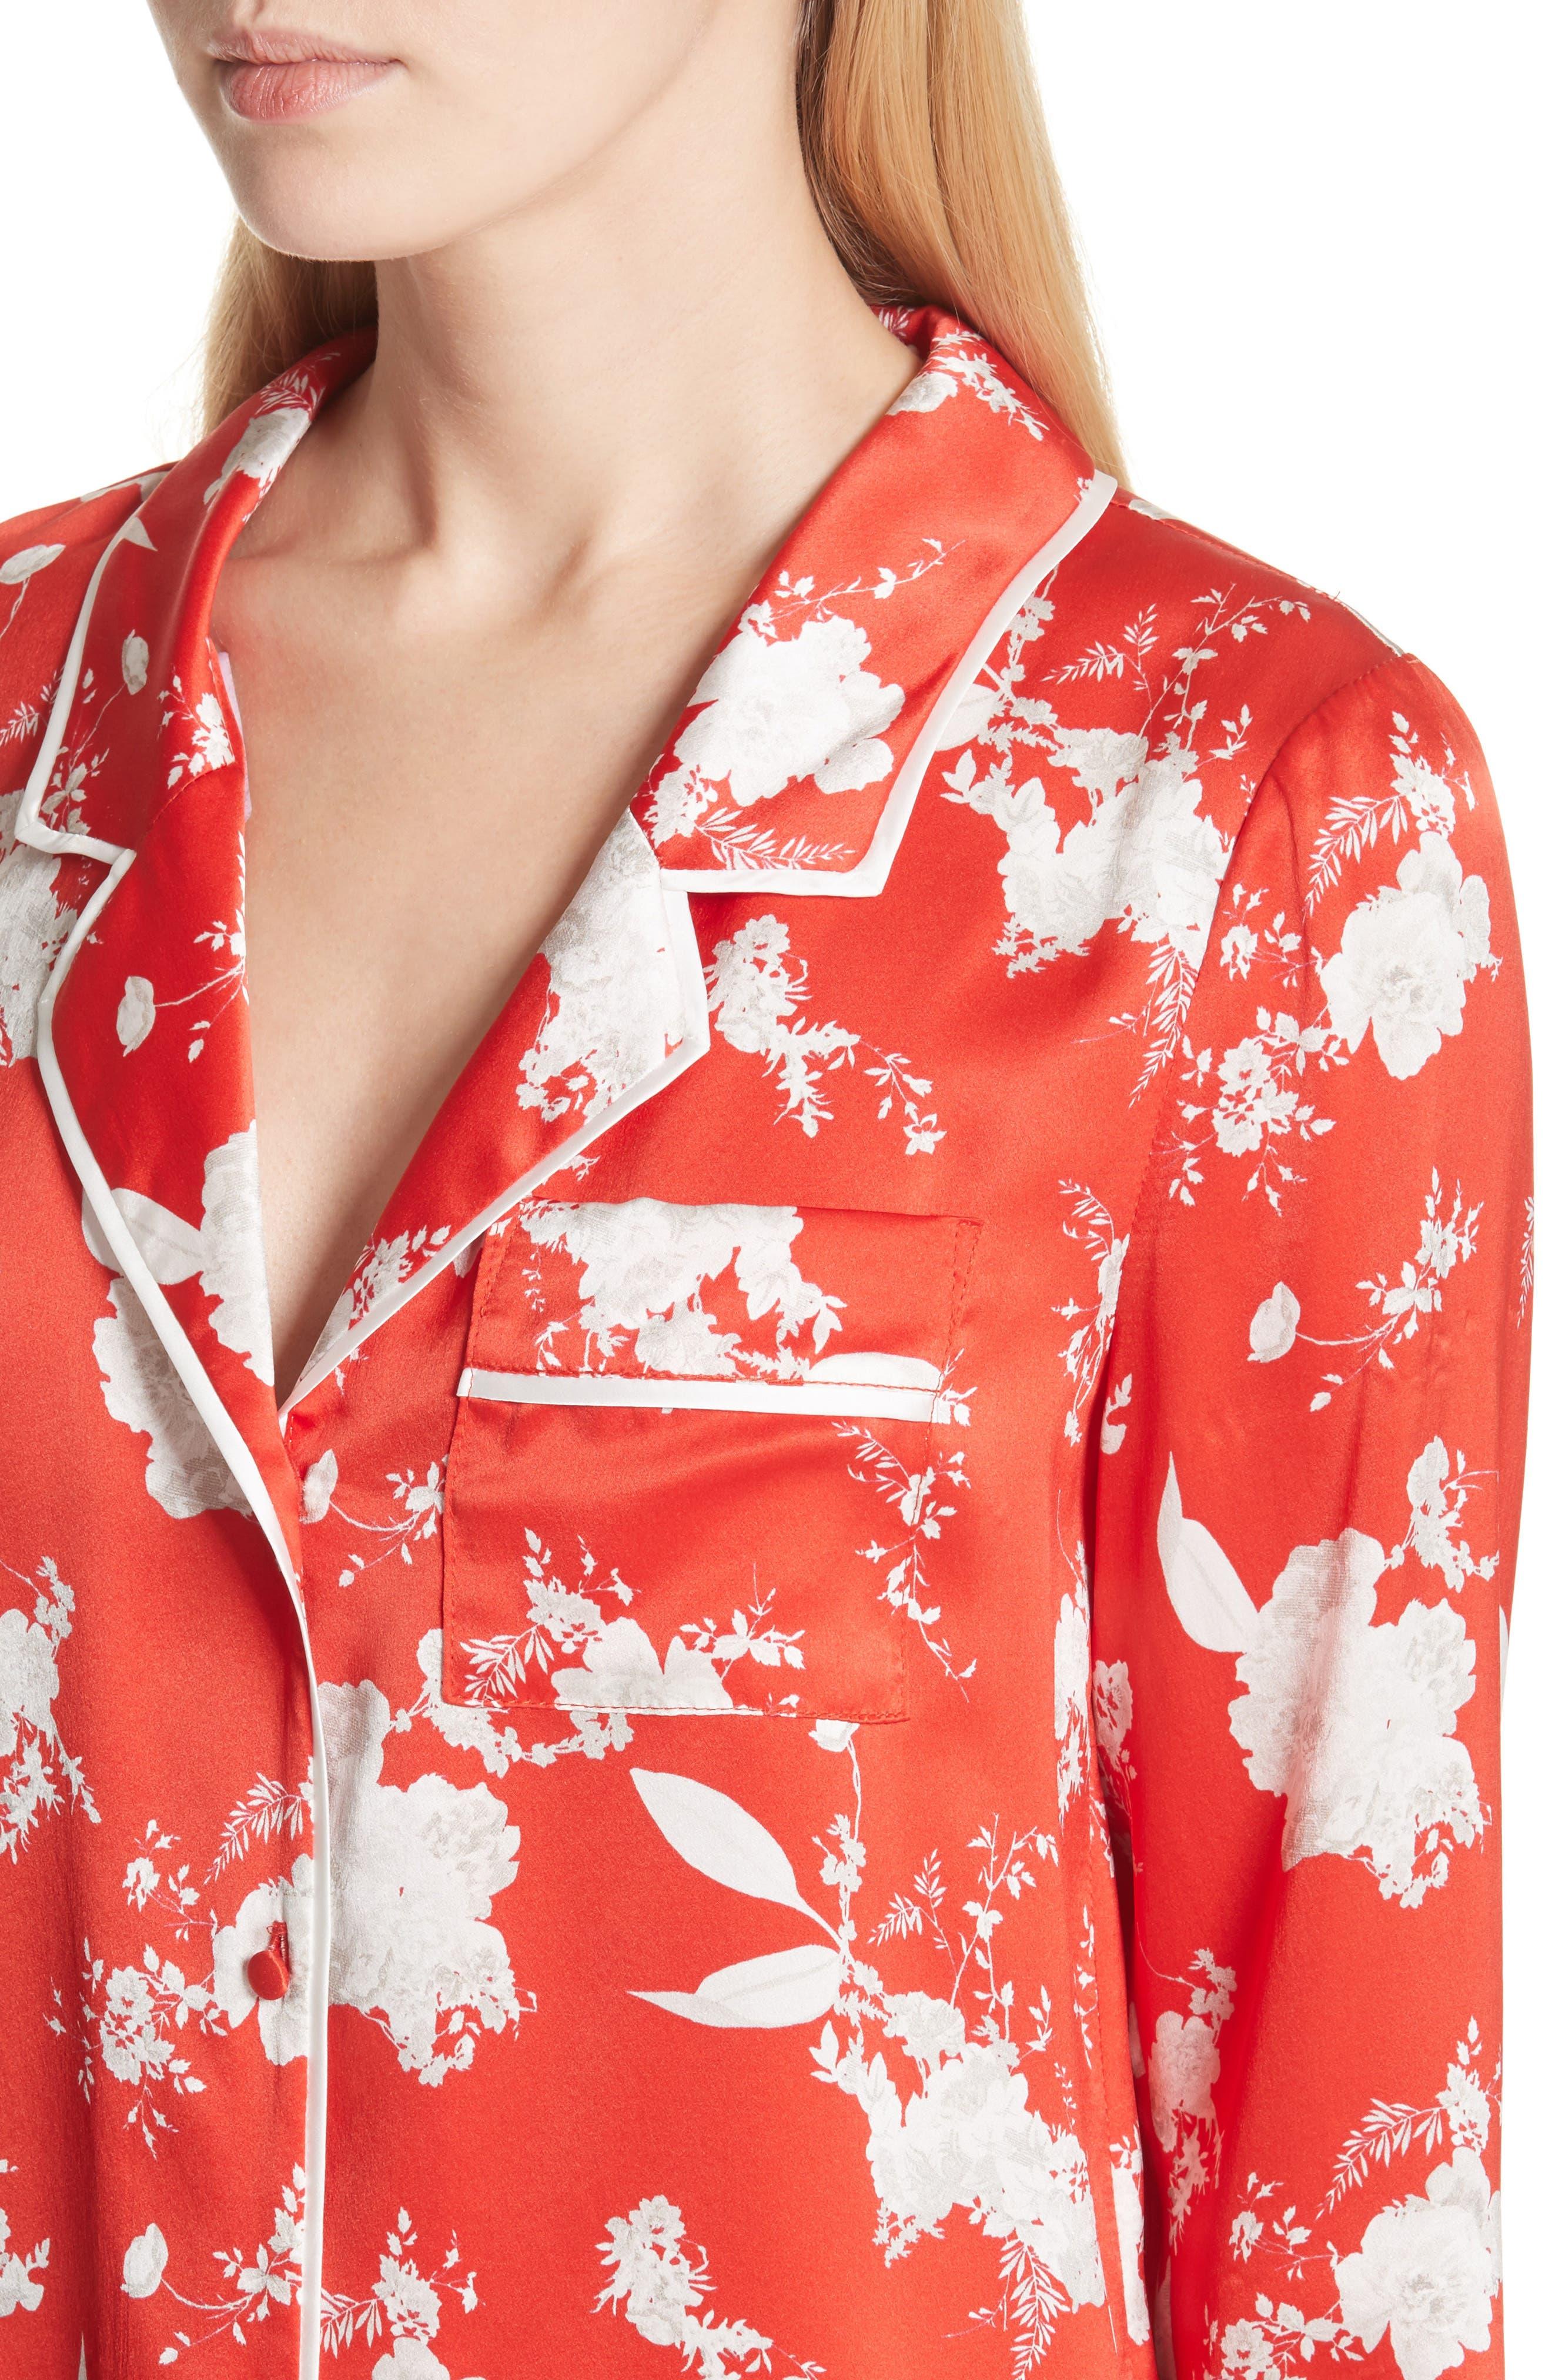 Keir Floral Silk Pajama Shirt,                             Alternate thumbnail 4, color,                             606